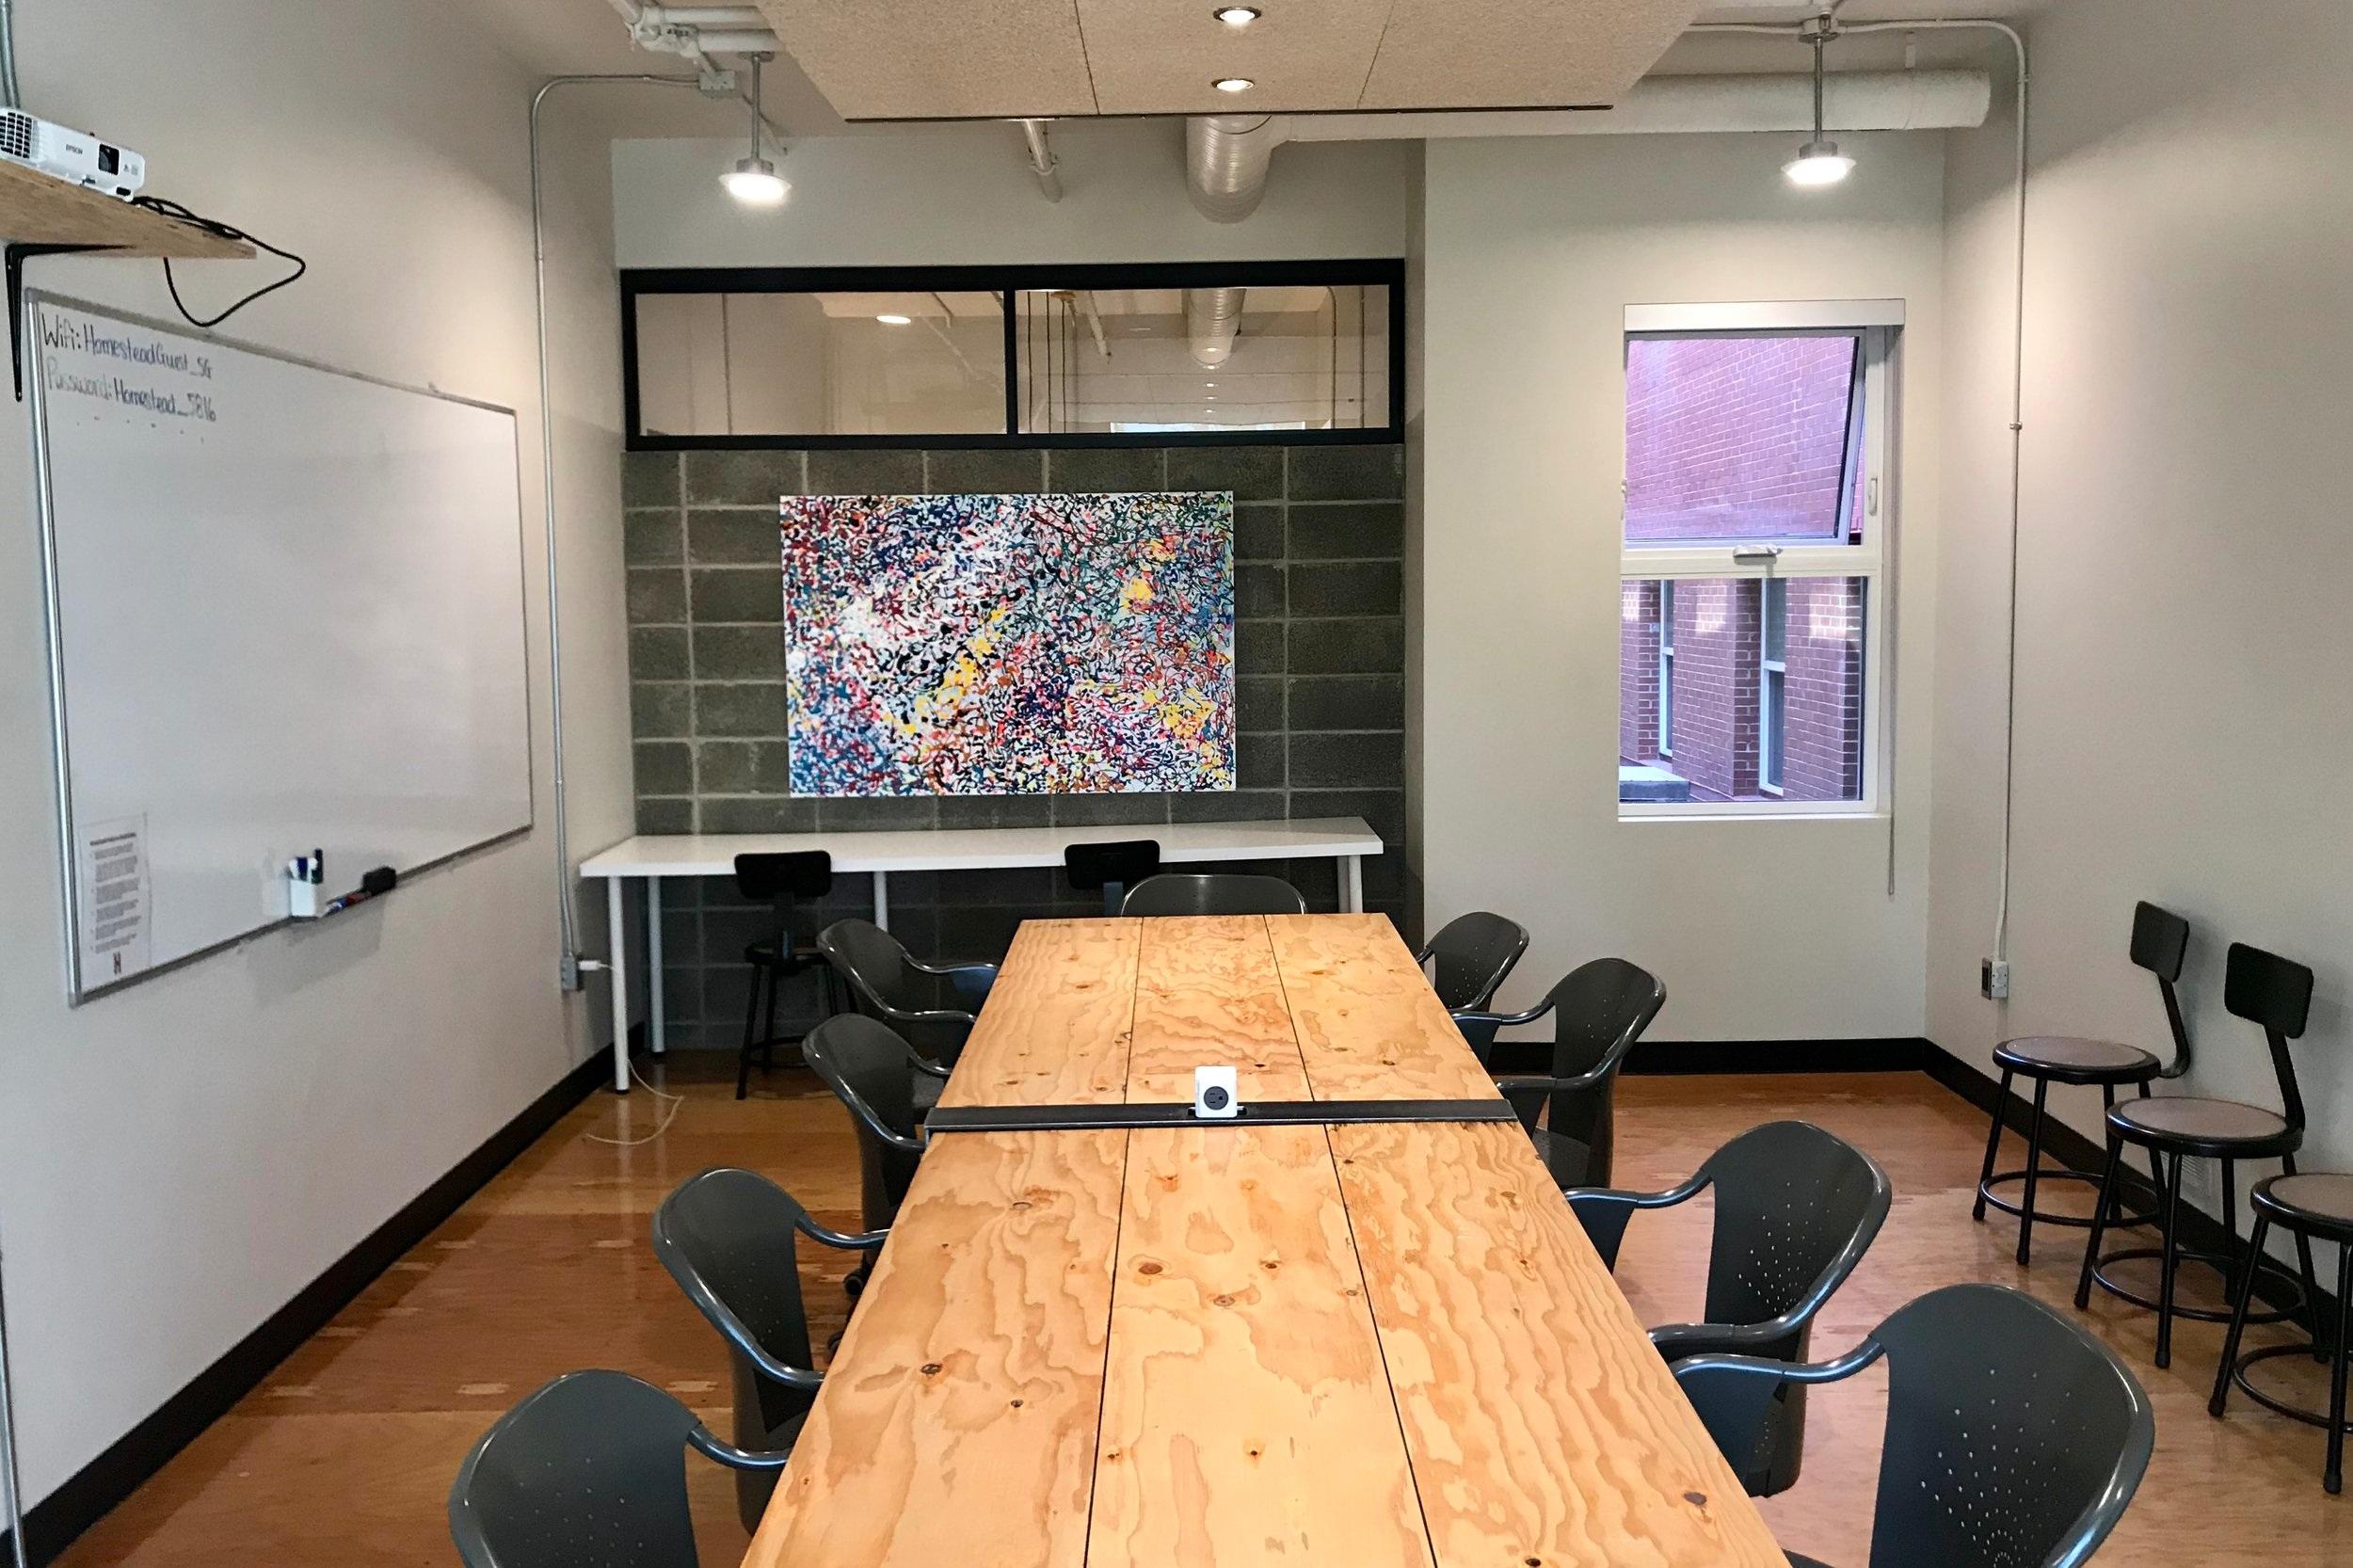 pehonan-boardroom-1531347551542.jpg